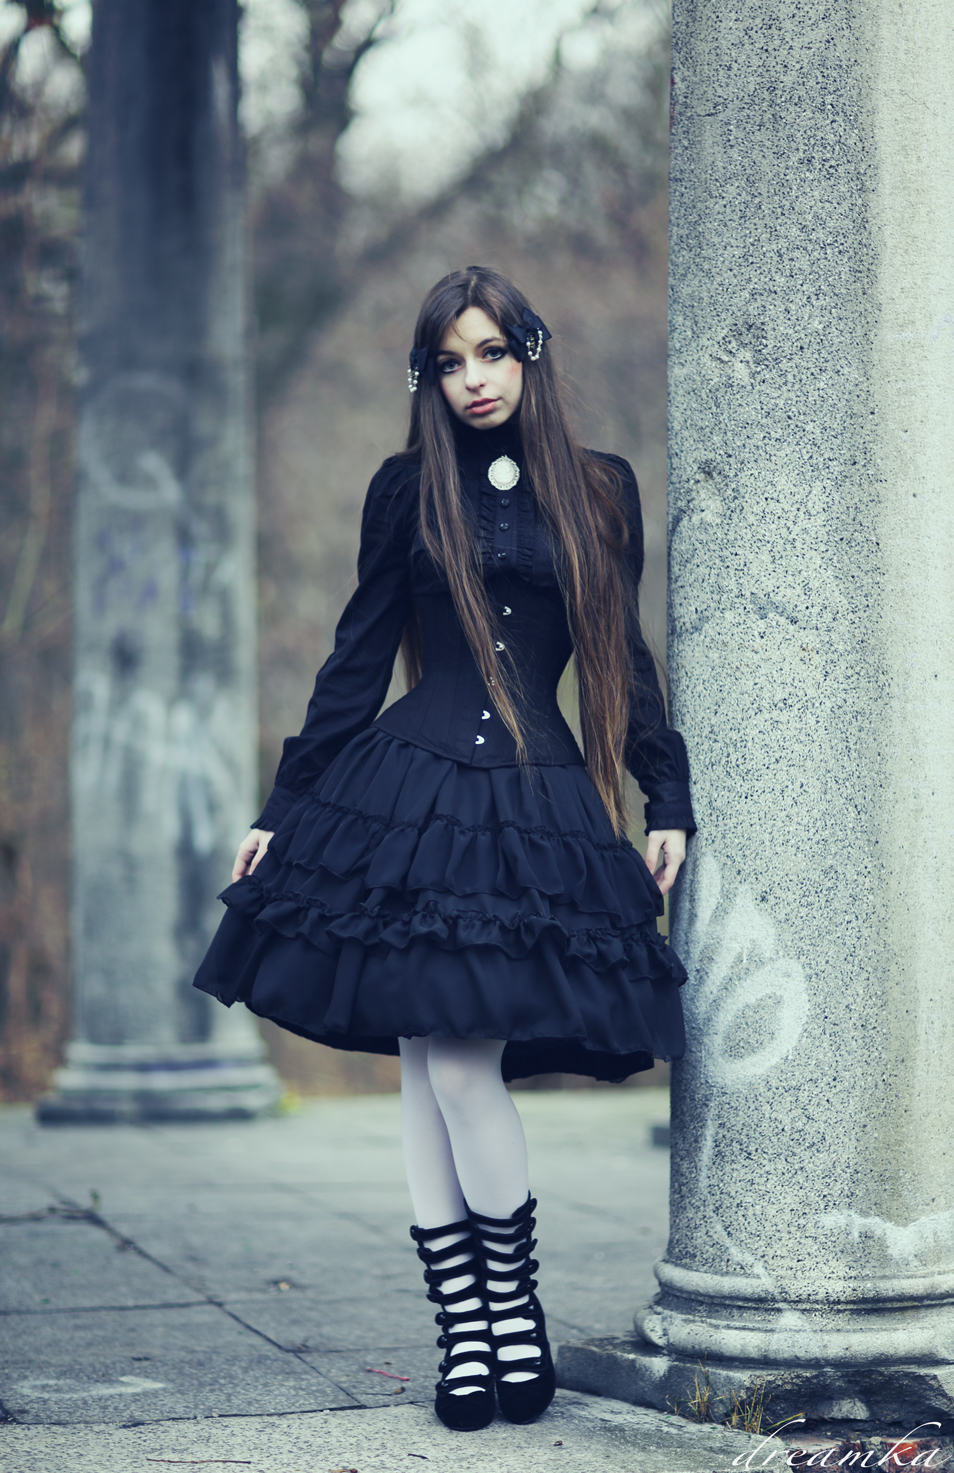 gothic_lolita_doll_by_sarielowa-d6xdji4